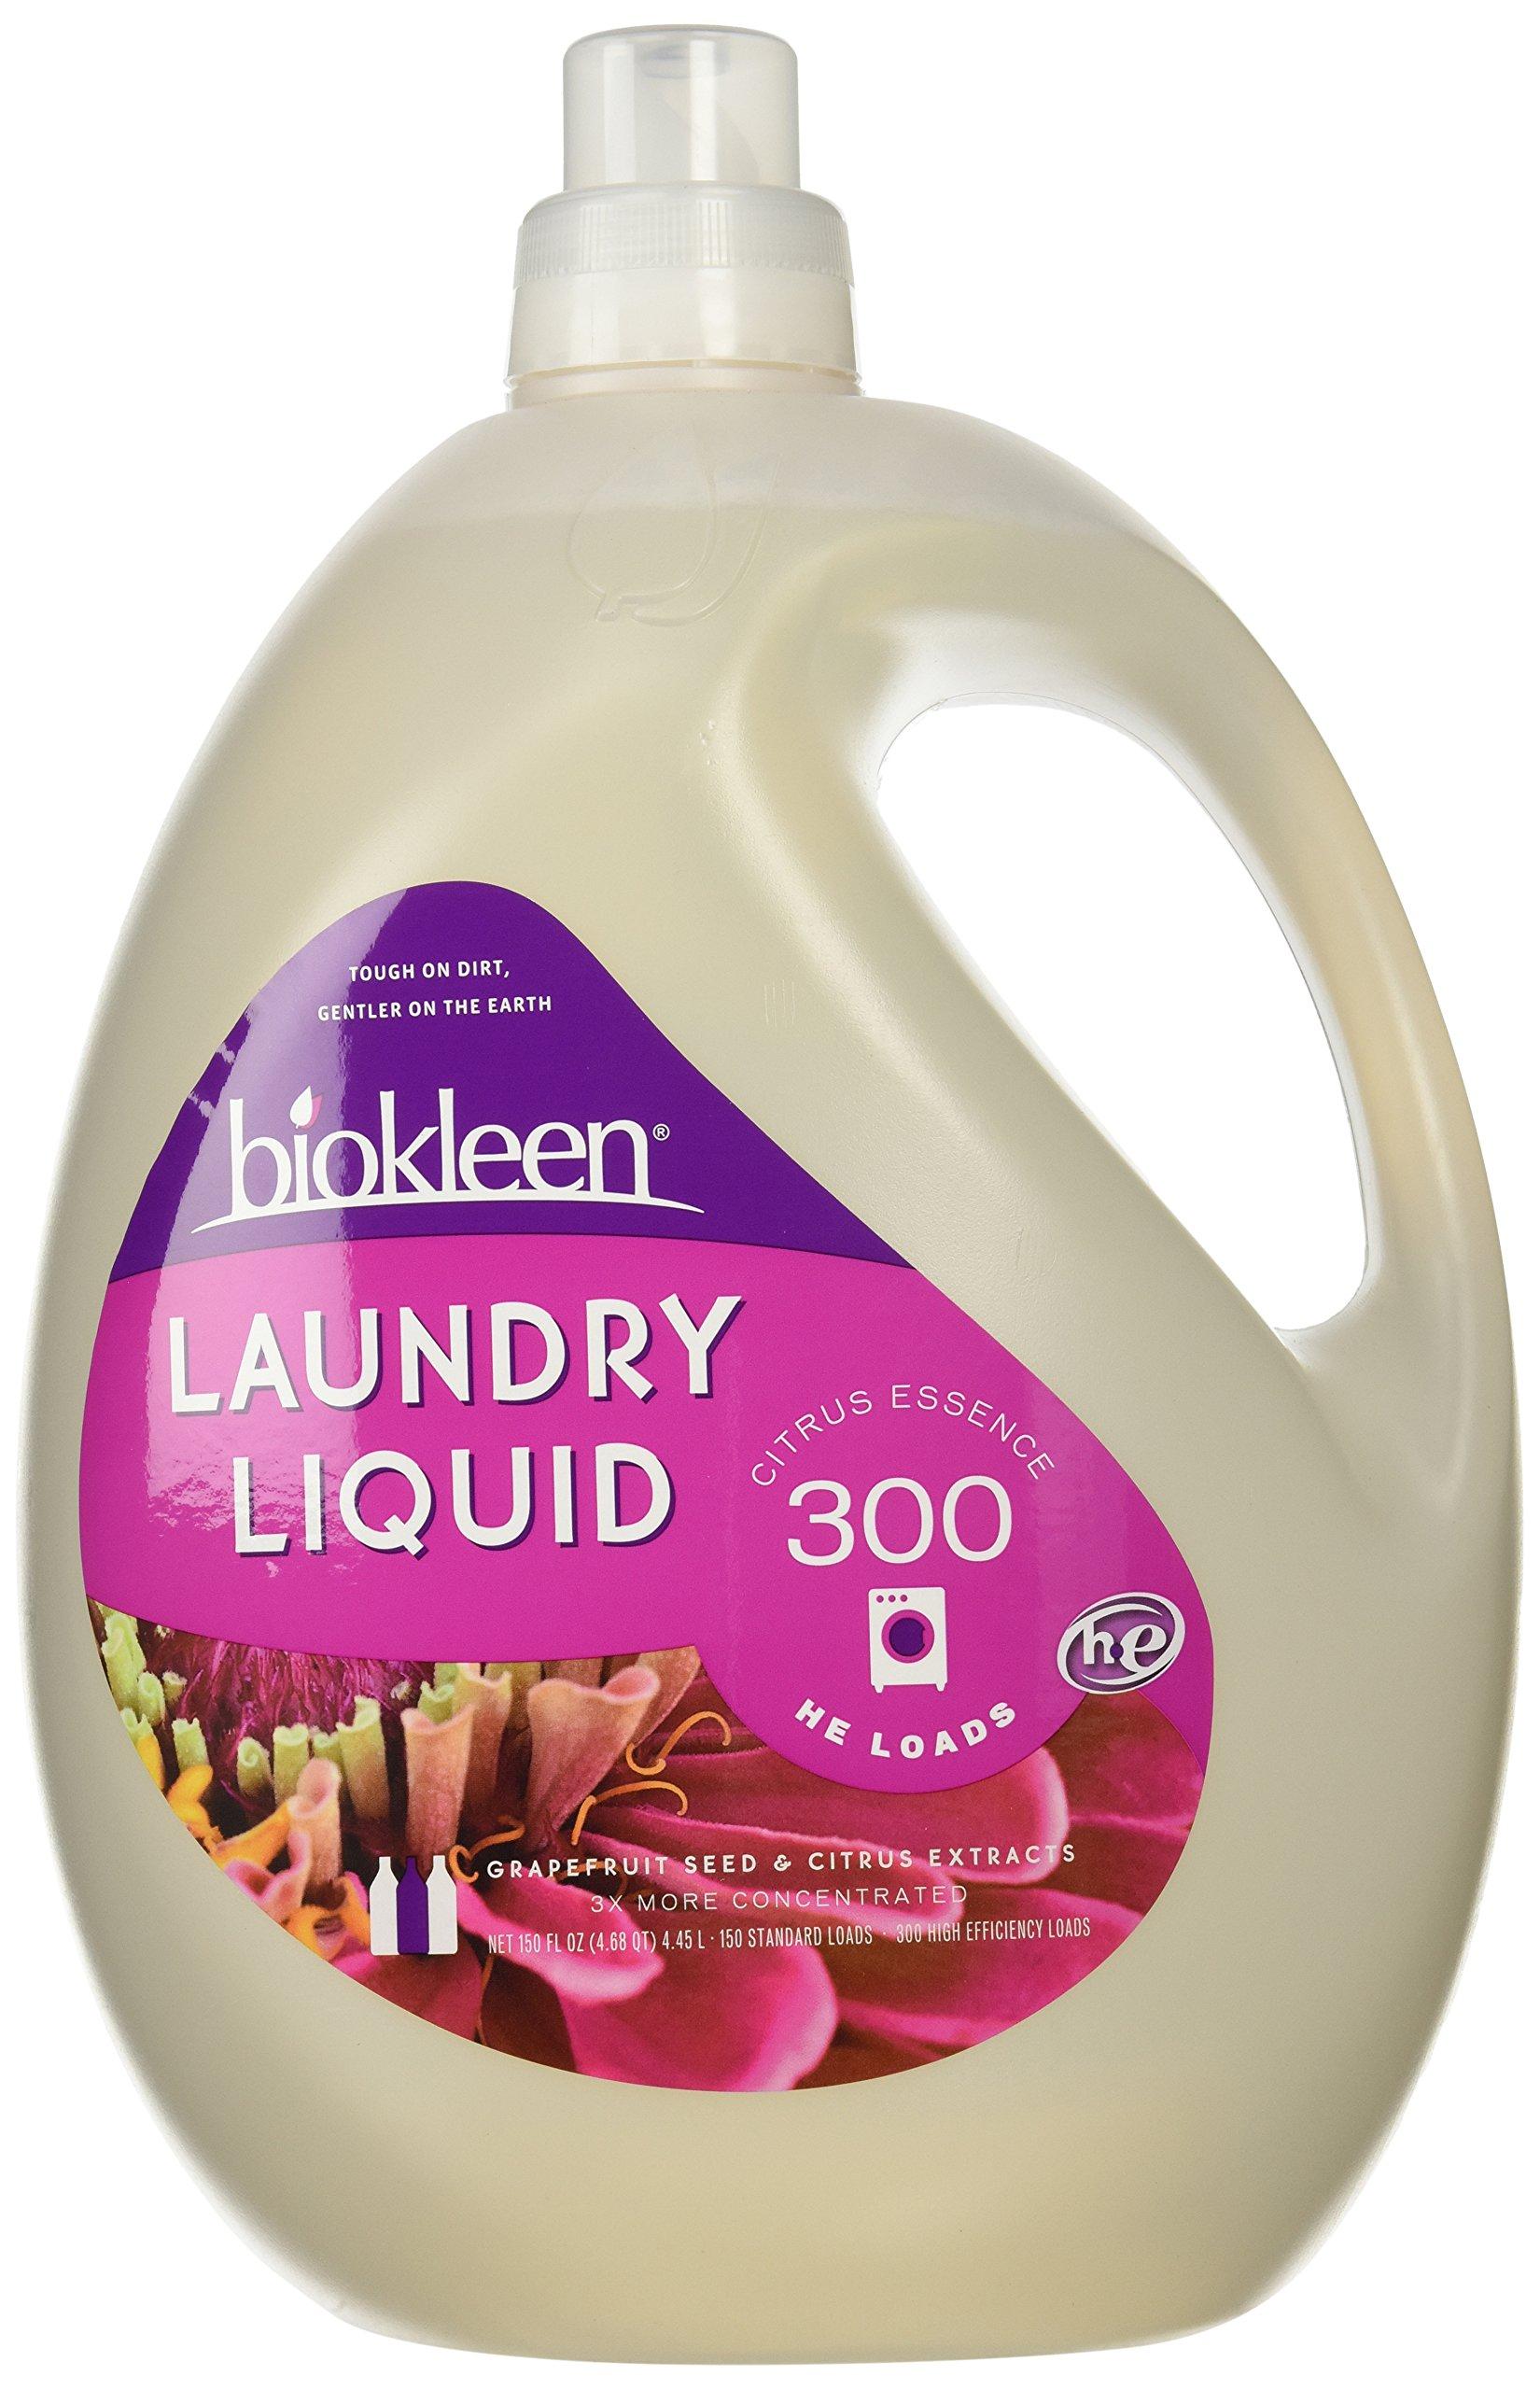 Biokleen Laundry Liquid, Citrus Essence, 150 oz - 300 HE Loads/150 Standard Loads